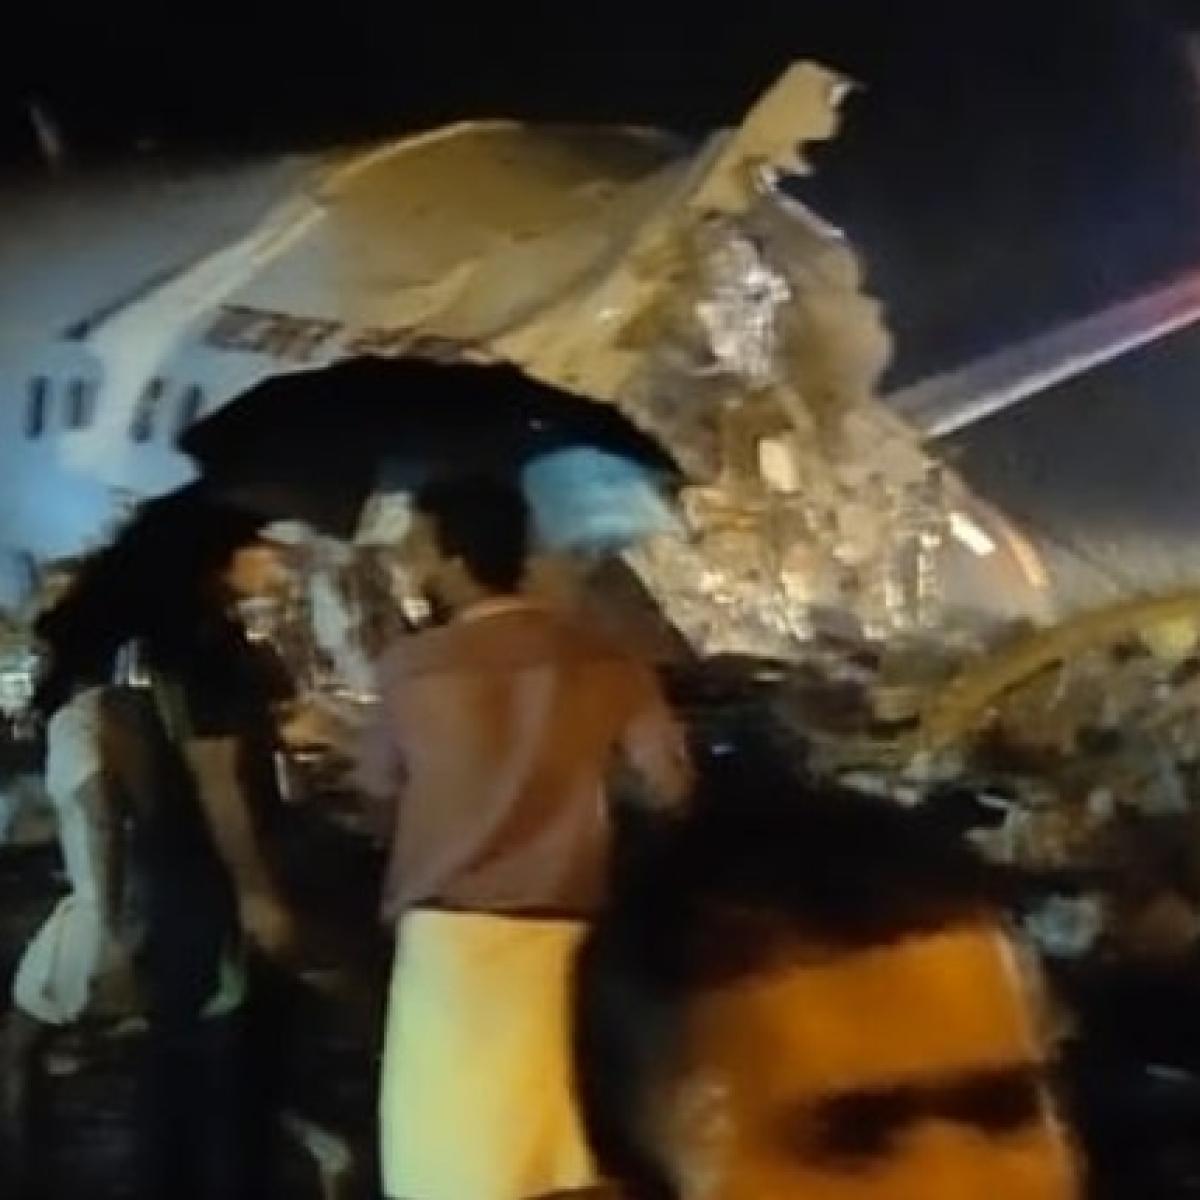 Calicut Air India Plane Crash: Amitabh Bachchan, Shah Rukh Khan and others express grief, offer condolences